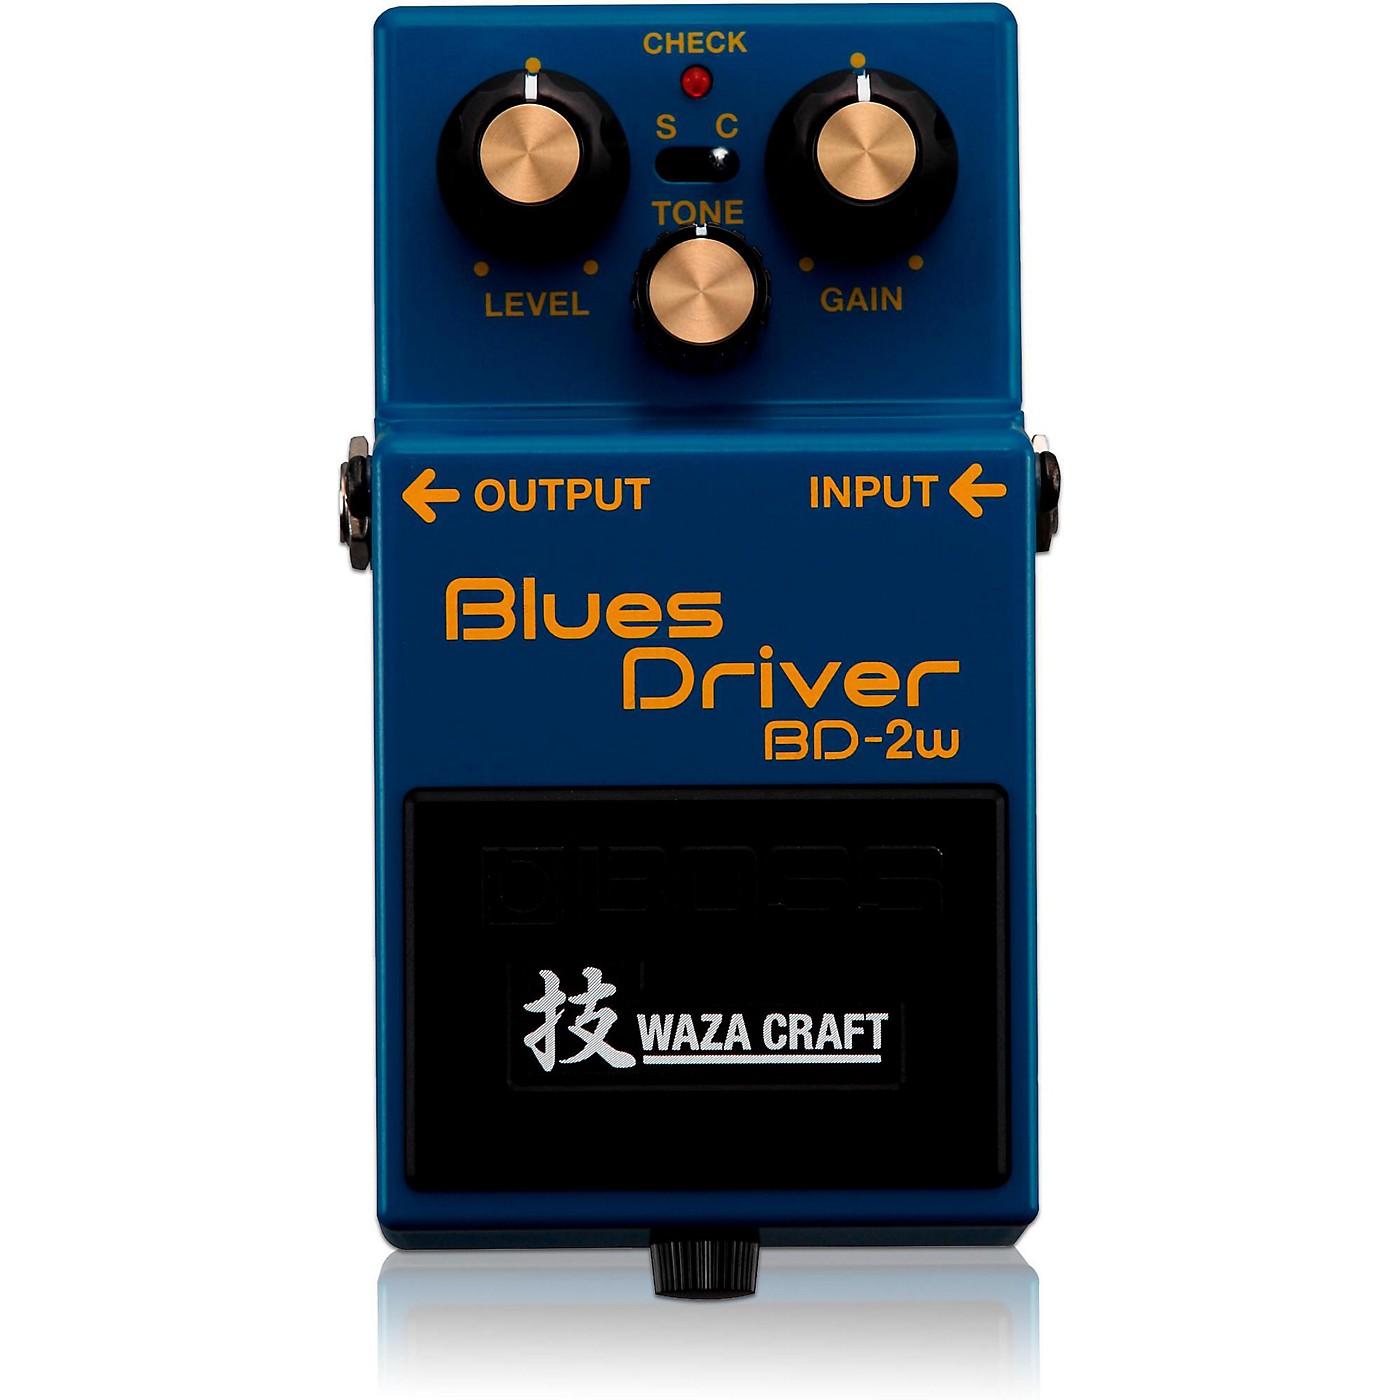 Boss BD-2W Blues Driver Waza Craft Guitar Effects Pedal thumbnail